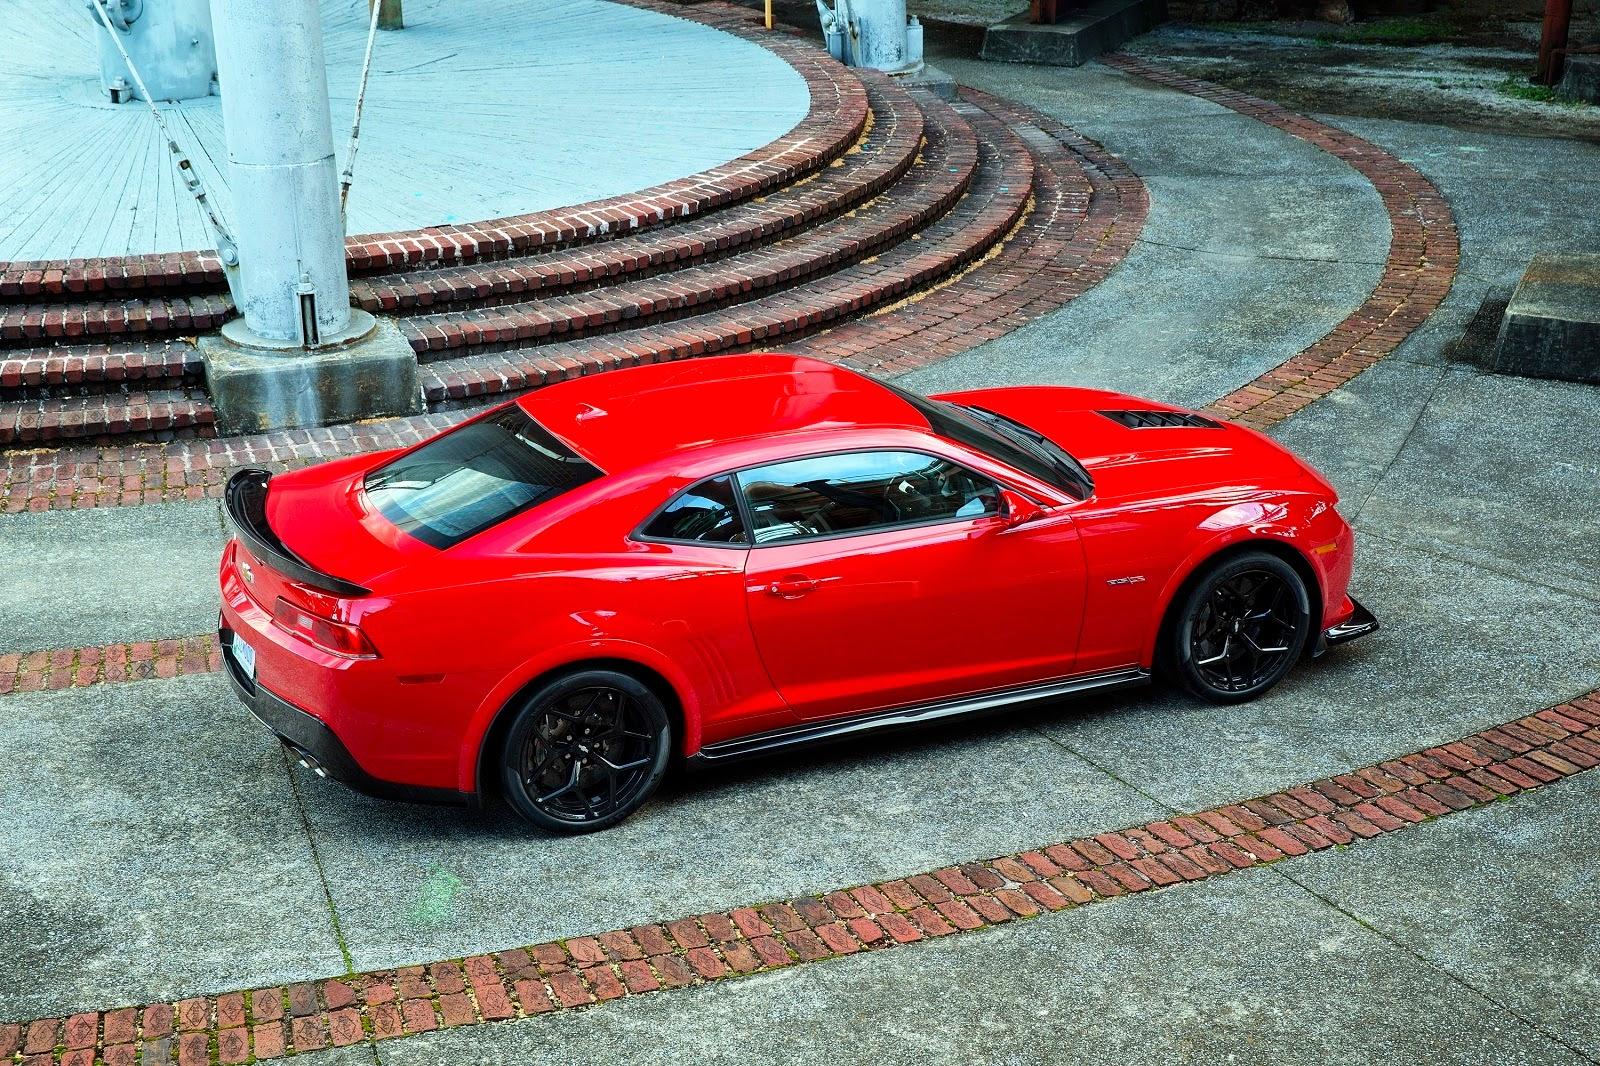 2015 chevrolet camaro z28 7 0l 505 hp car reviews new car pictures for 2018 2019. Black Bedroom Furniture Sets. Home Design Ideas